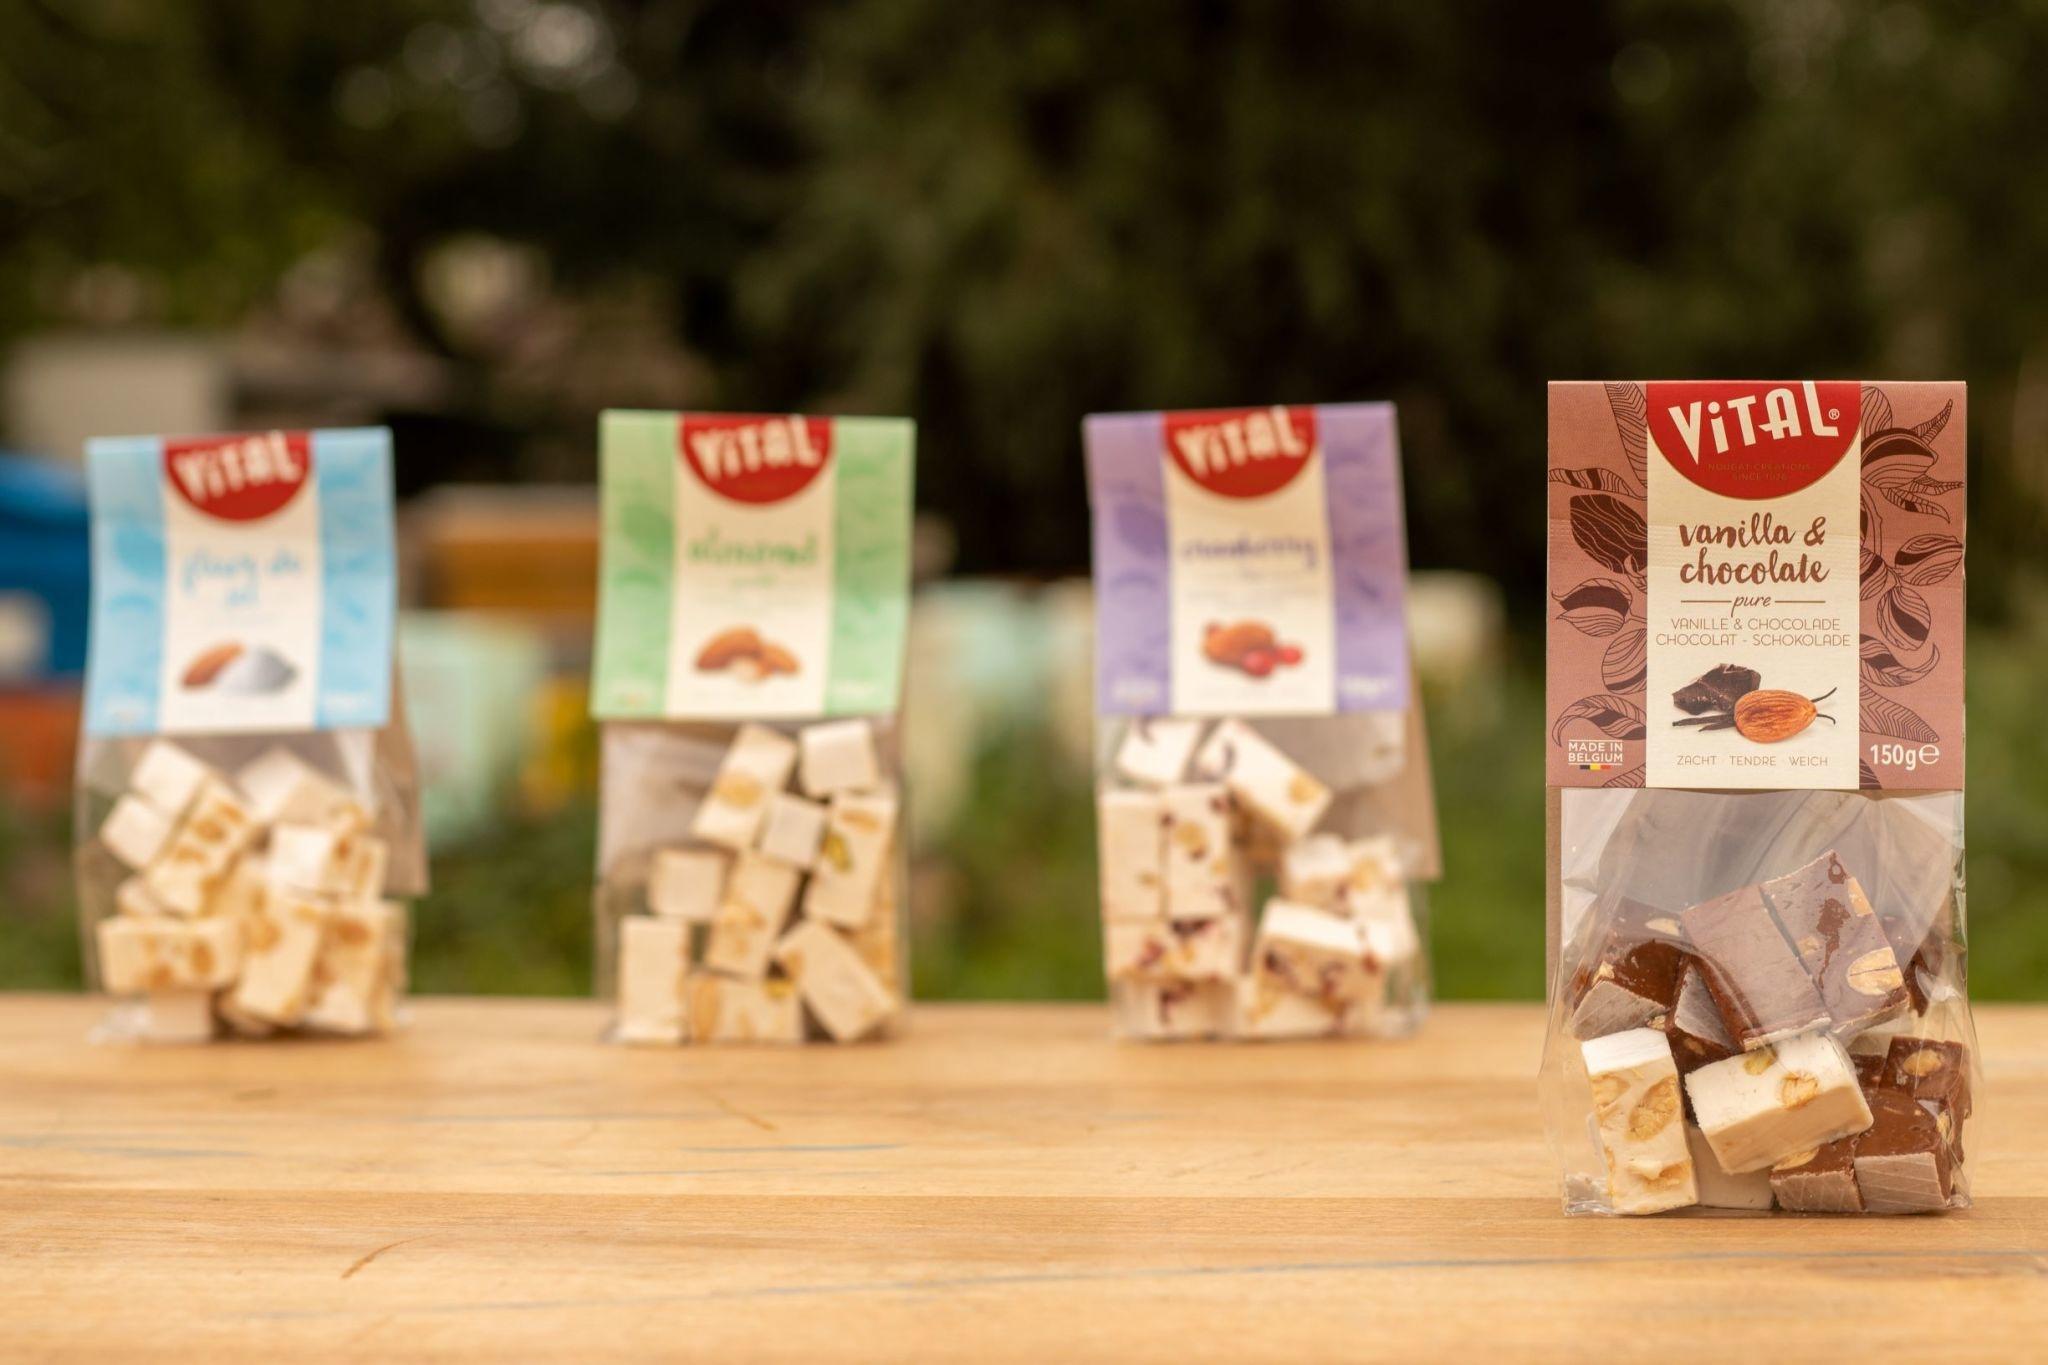 Zakje Nougat - vanille & chocolade - 150 gr-1